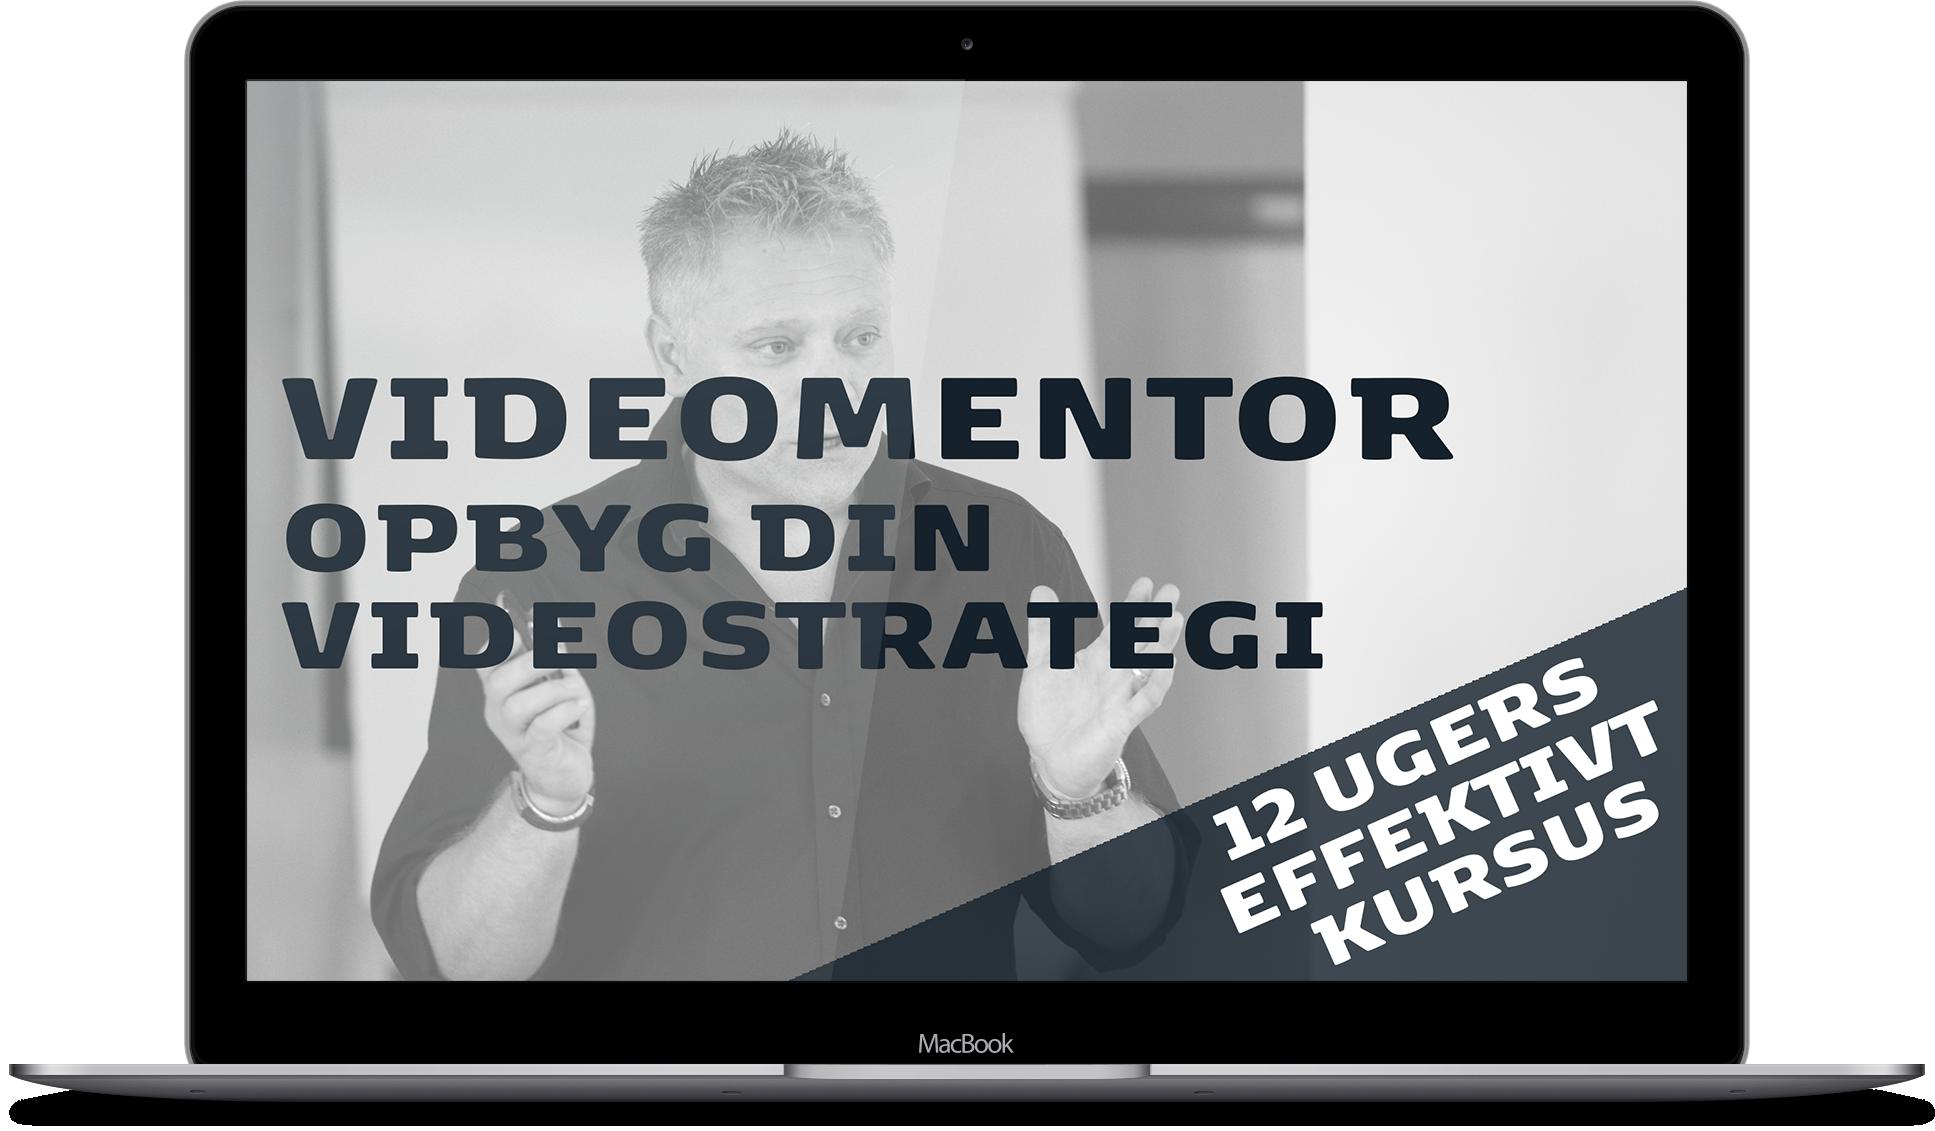 VIDEOMENTOR1.png